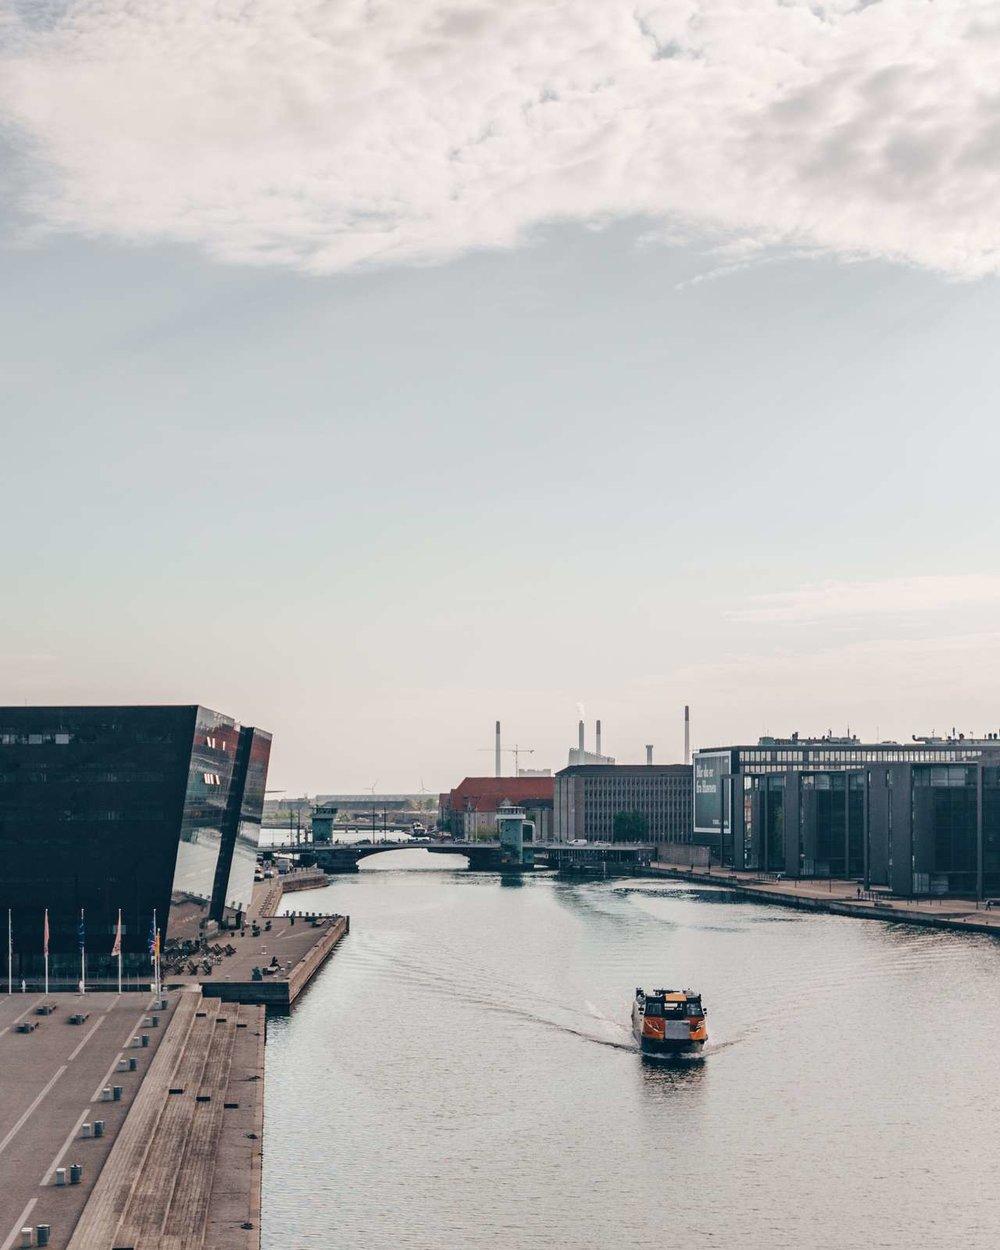 Photo by Astrid Maria Rasmussen - Copenhagen Media Center